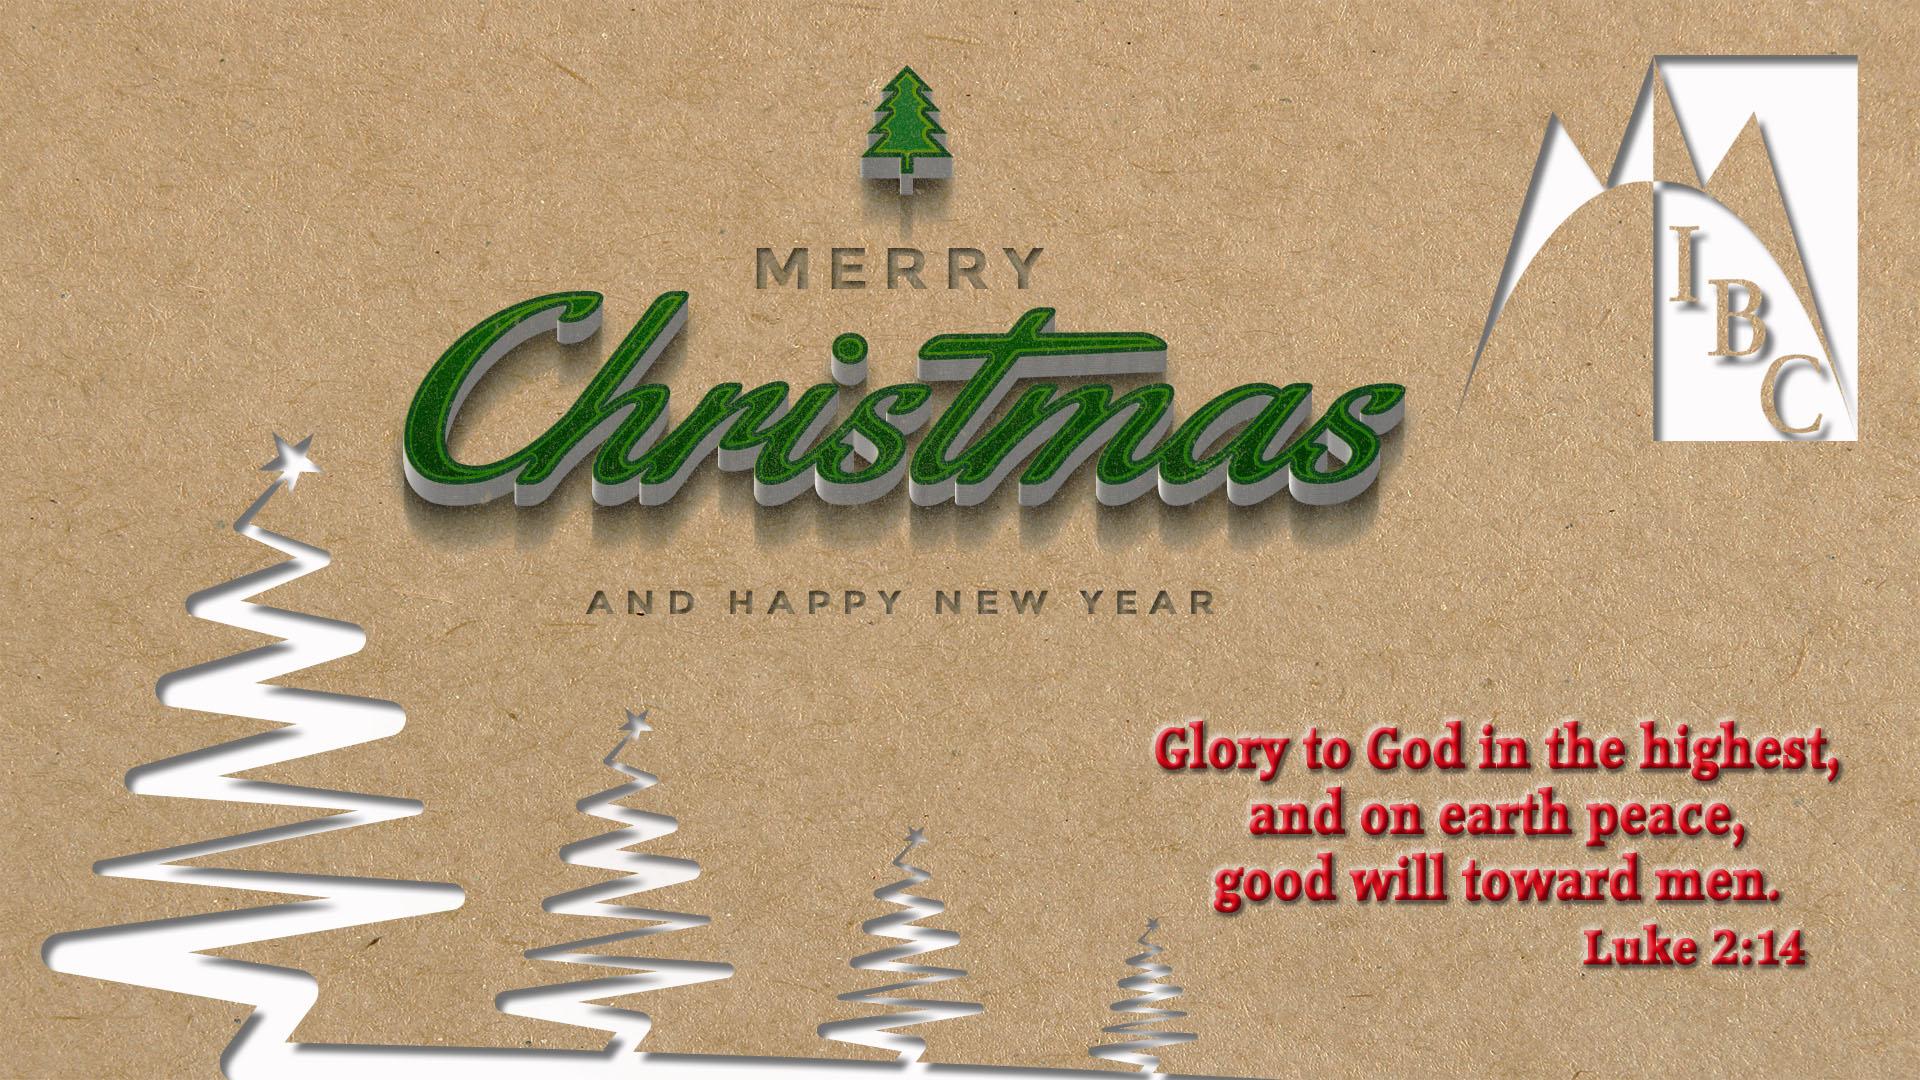 2018 Christmas Email Image